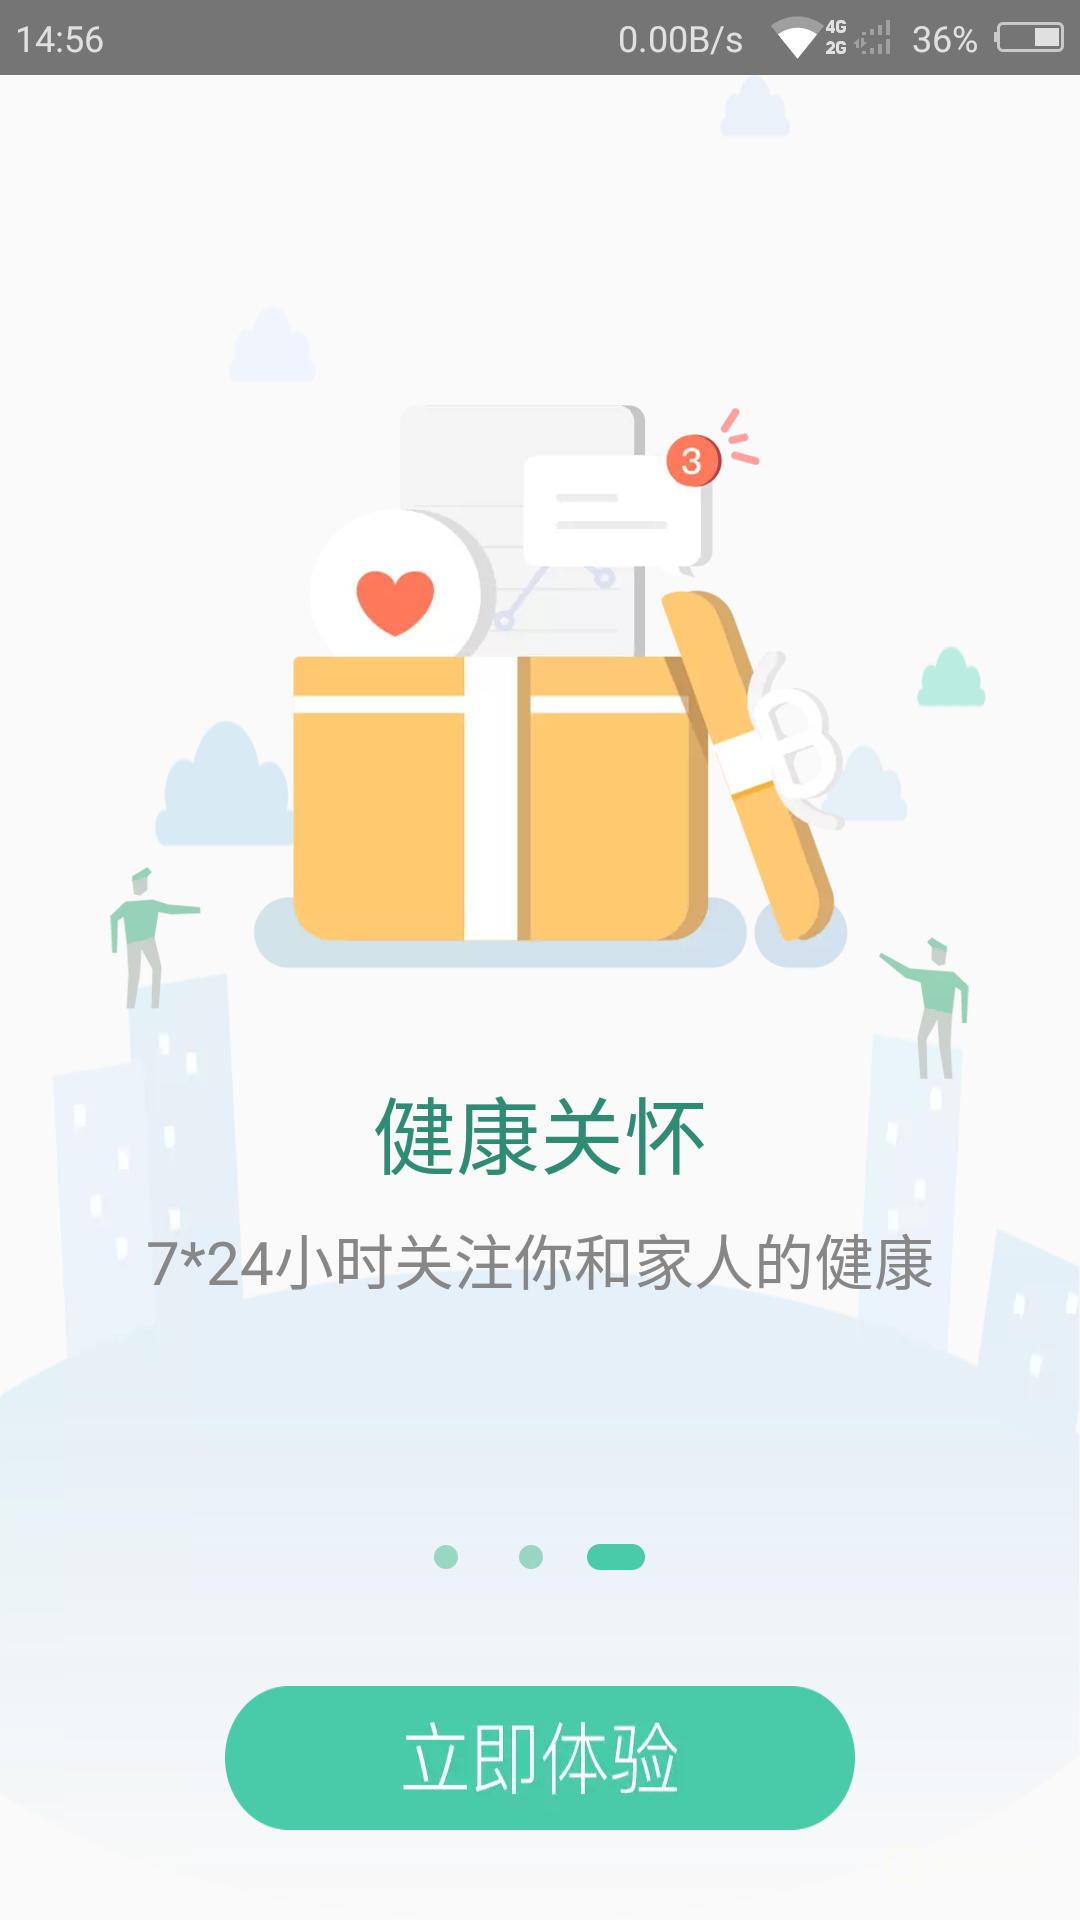 Screenshot_2018-01-31-14-56-41.png